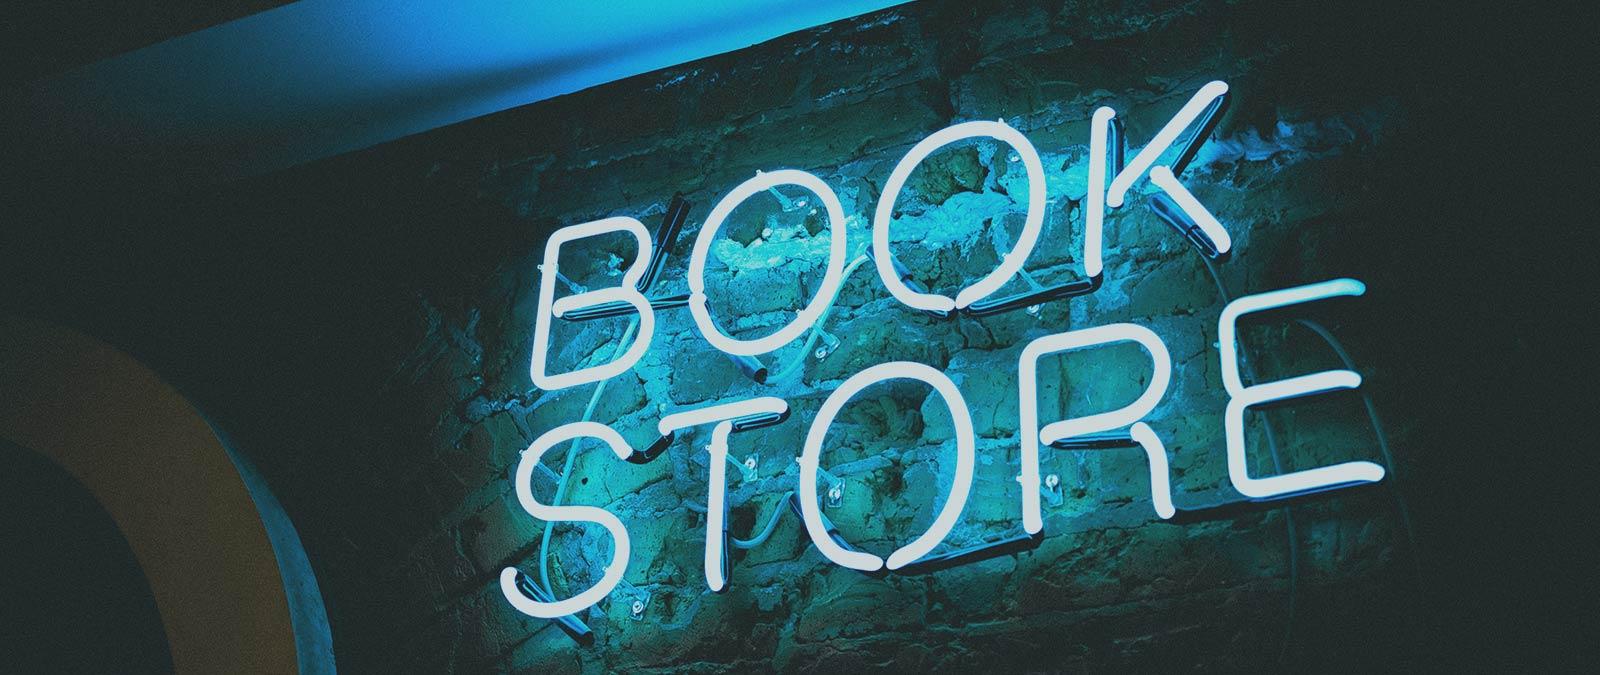 Buch Blog Tipps